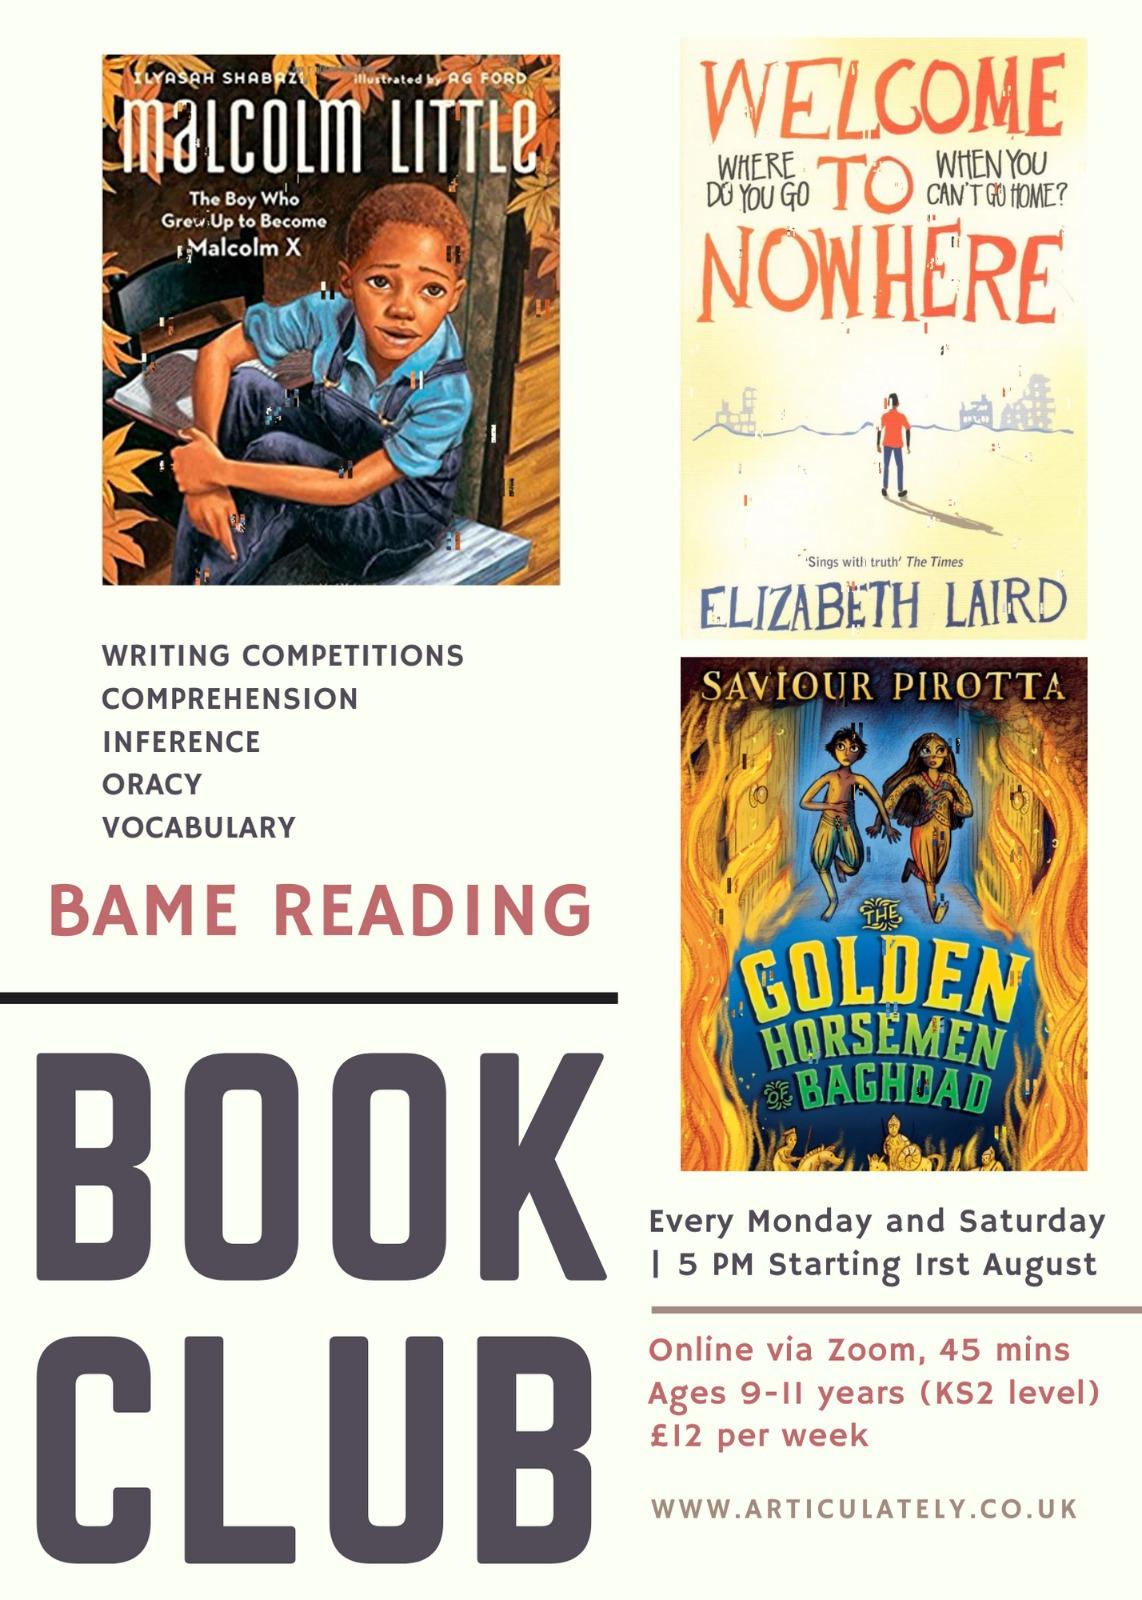 CHILDREN'S BAME READING SUMMER CLUB